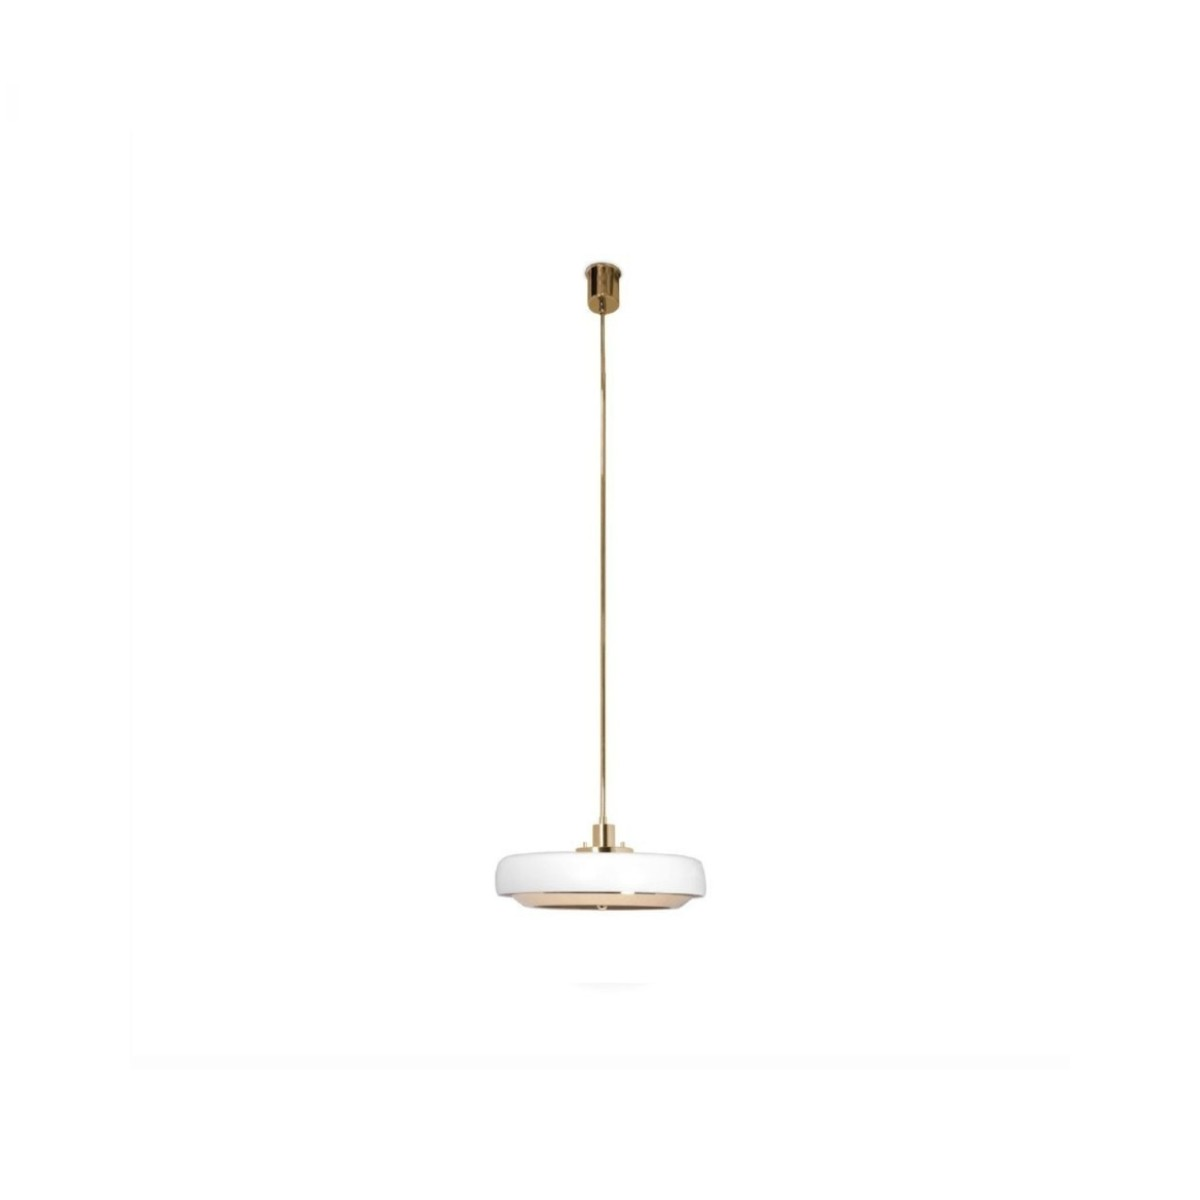 CARTER PENDANT LAMP